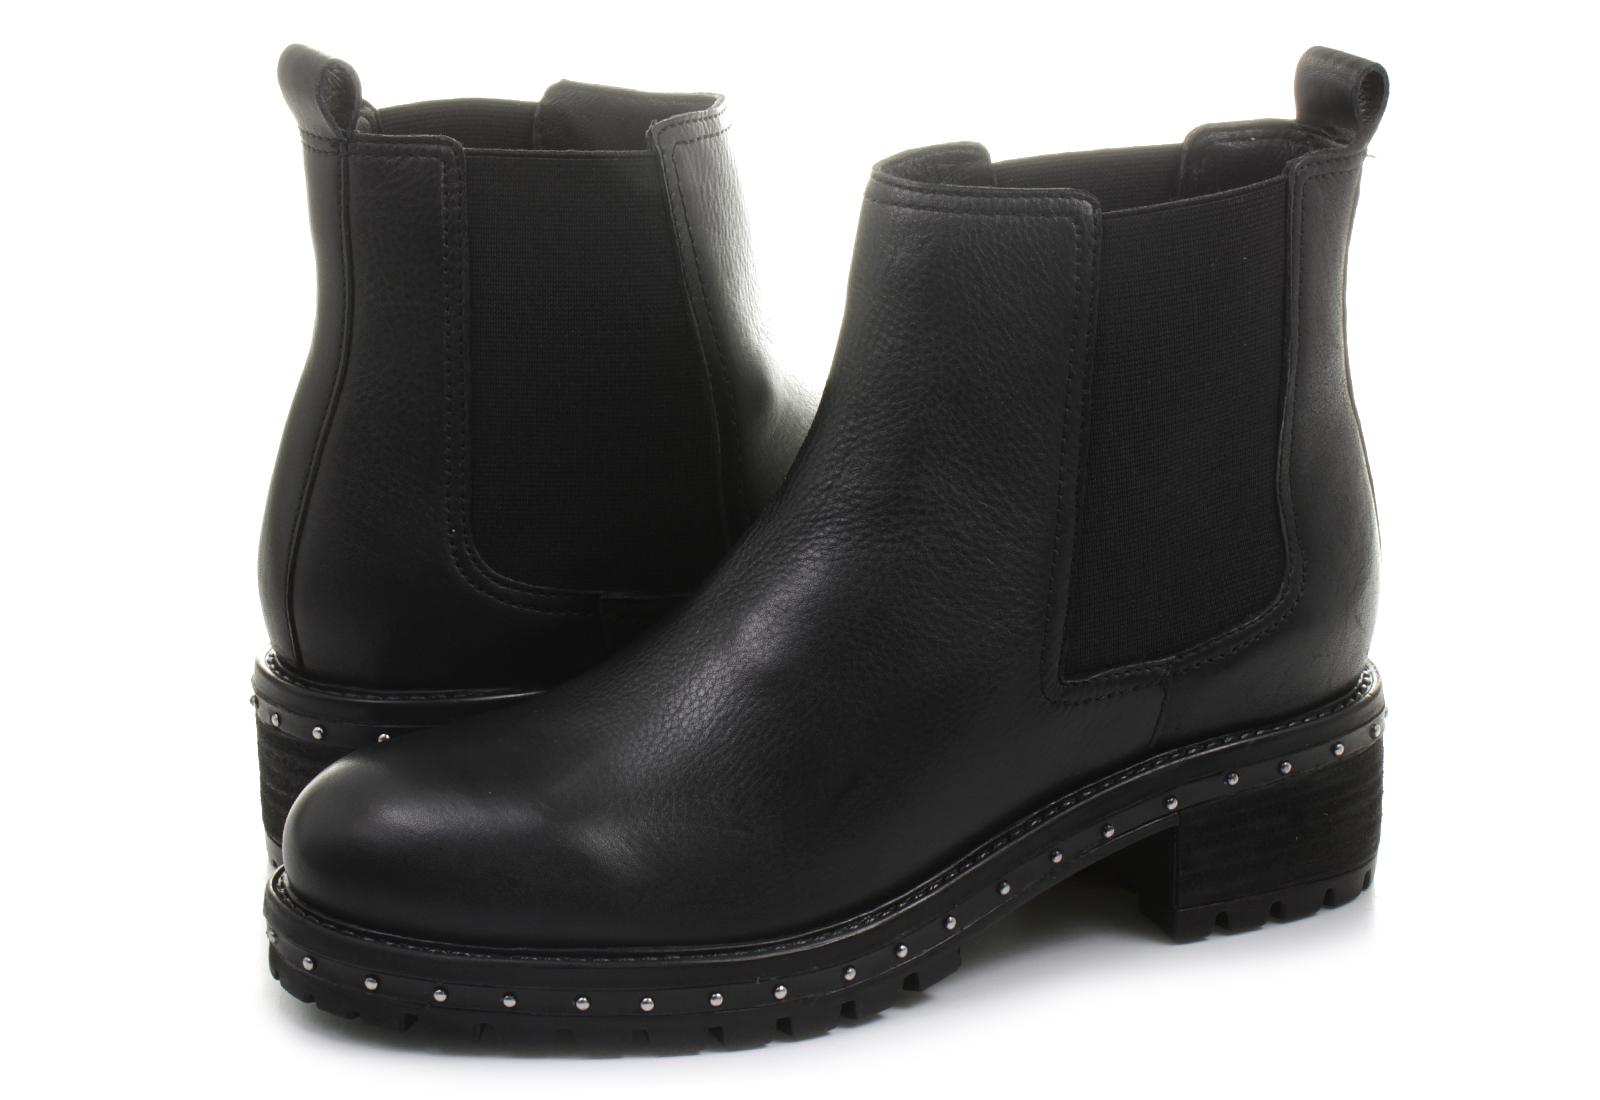 Bronx Vysoké boty Chelsea boots - 46956-c-01 - 46956-C-01Tenisky ... 5471c35b51